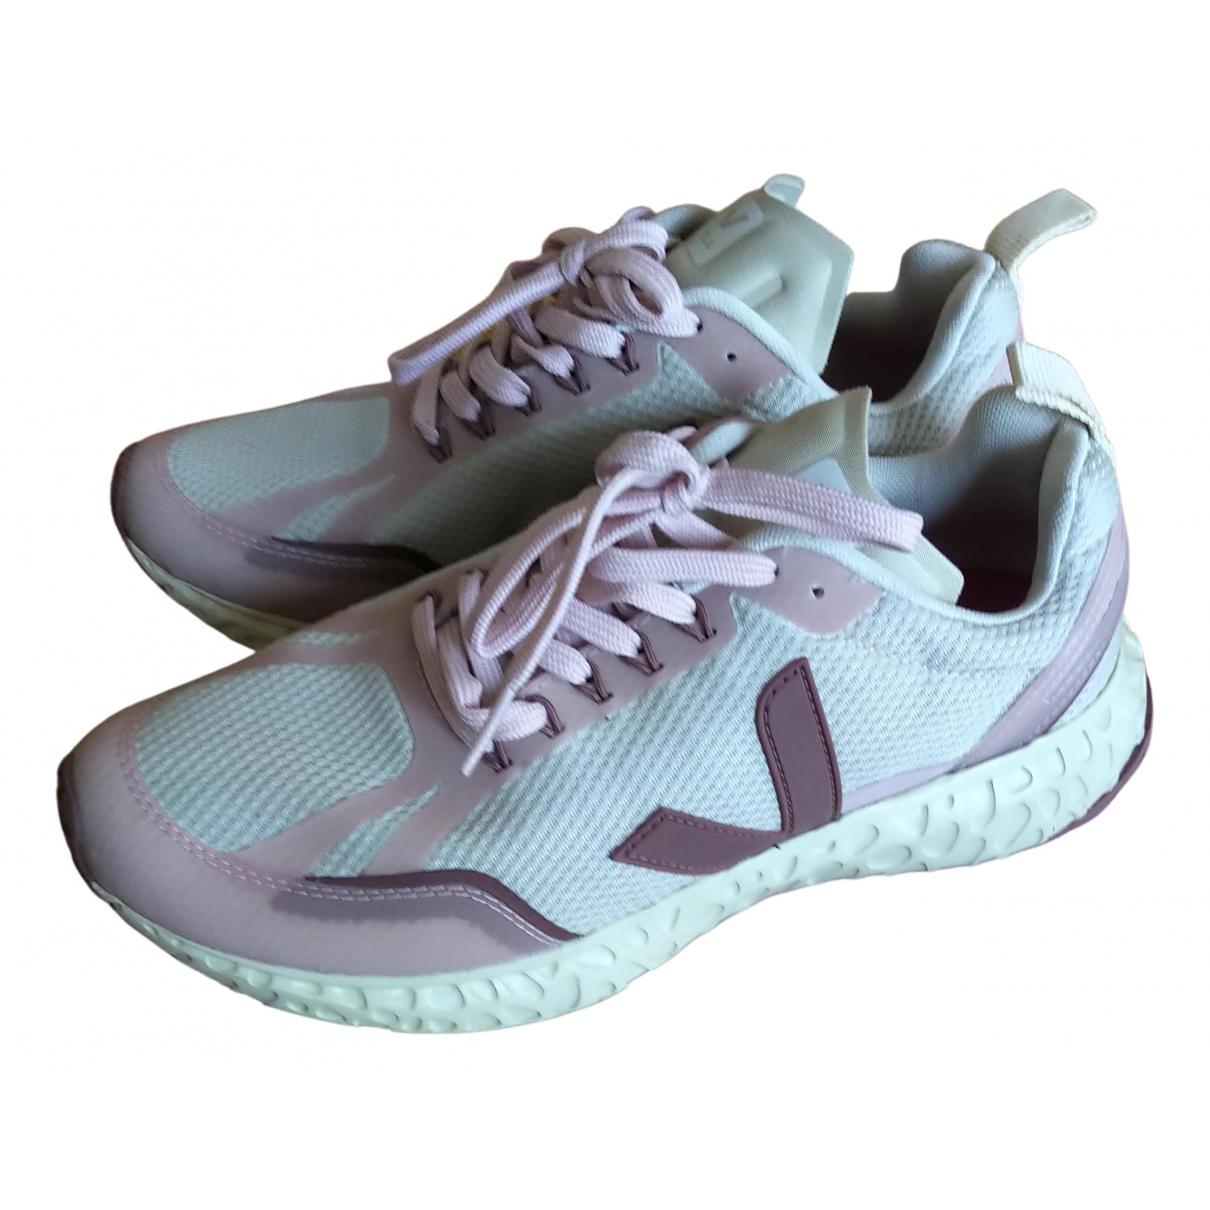 Veja \N Sneakers in  Beige Kautschuk